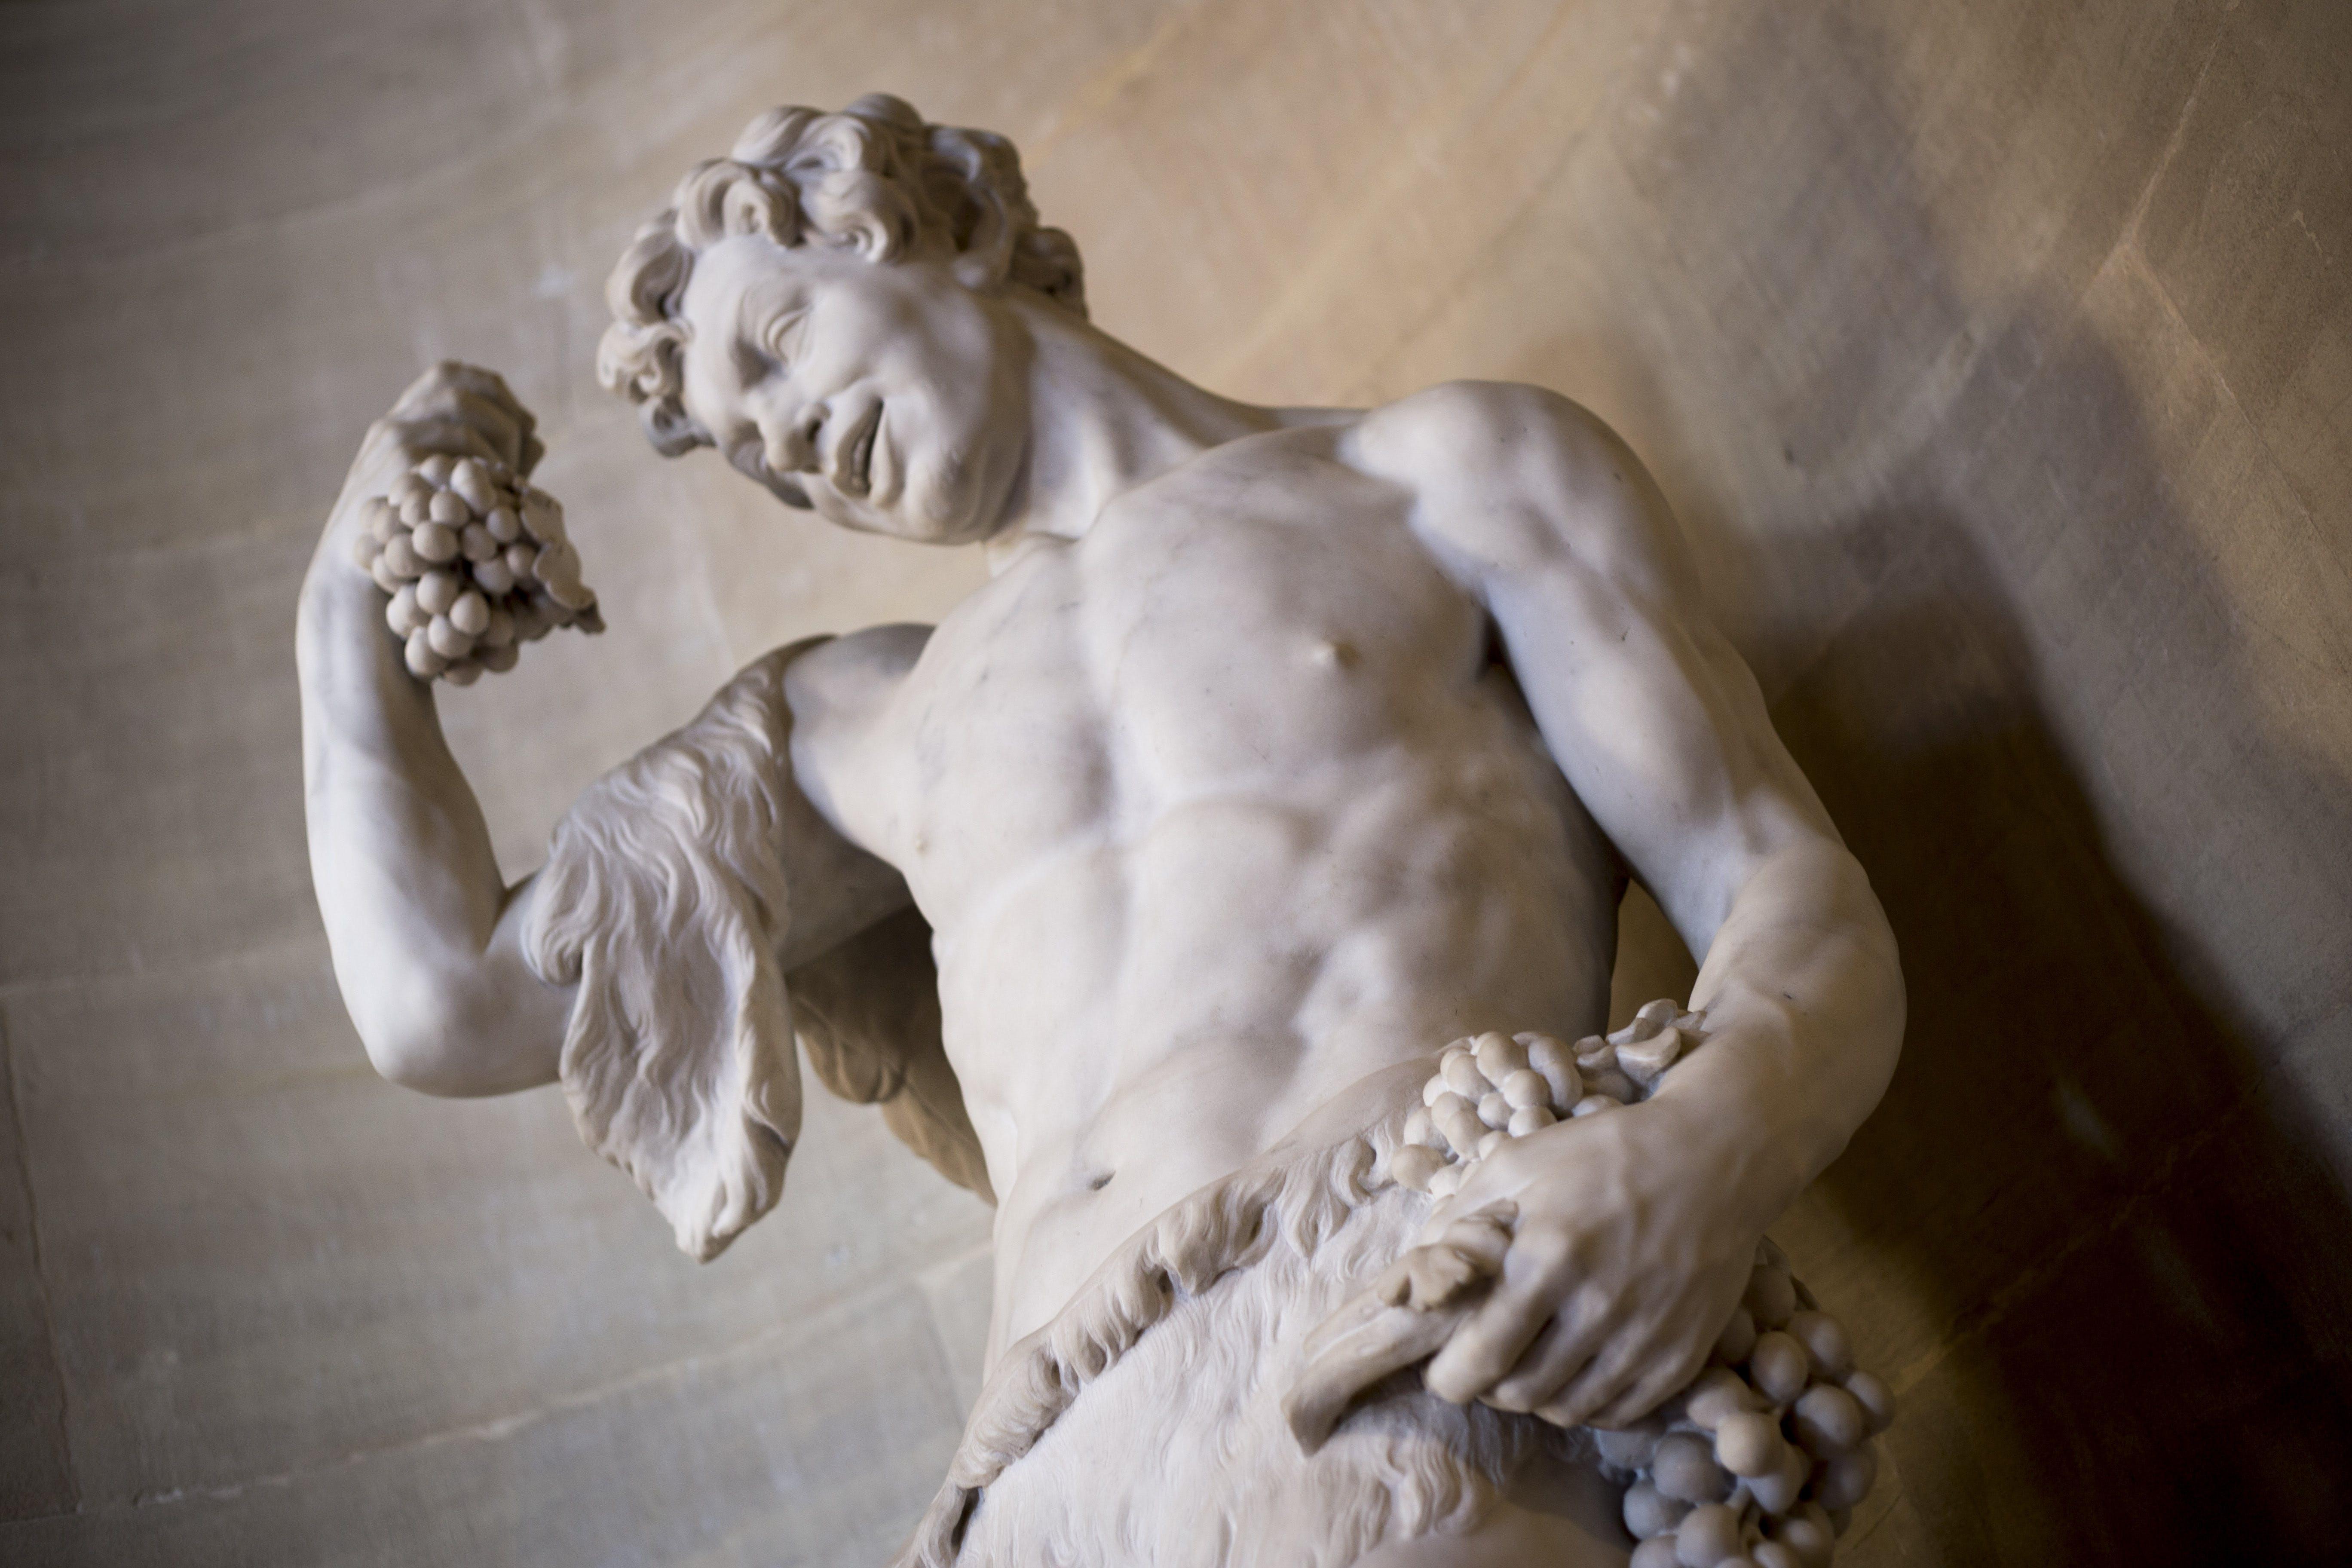 Gratis lagerfoto af arkitektur, kunst, skulptur, statue